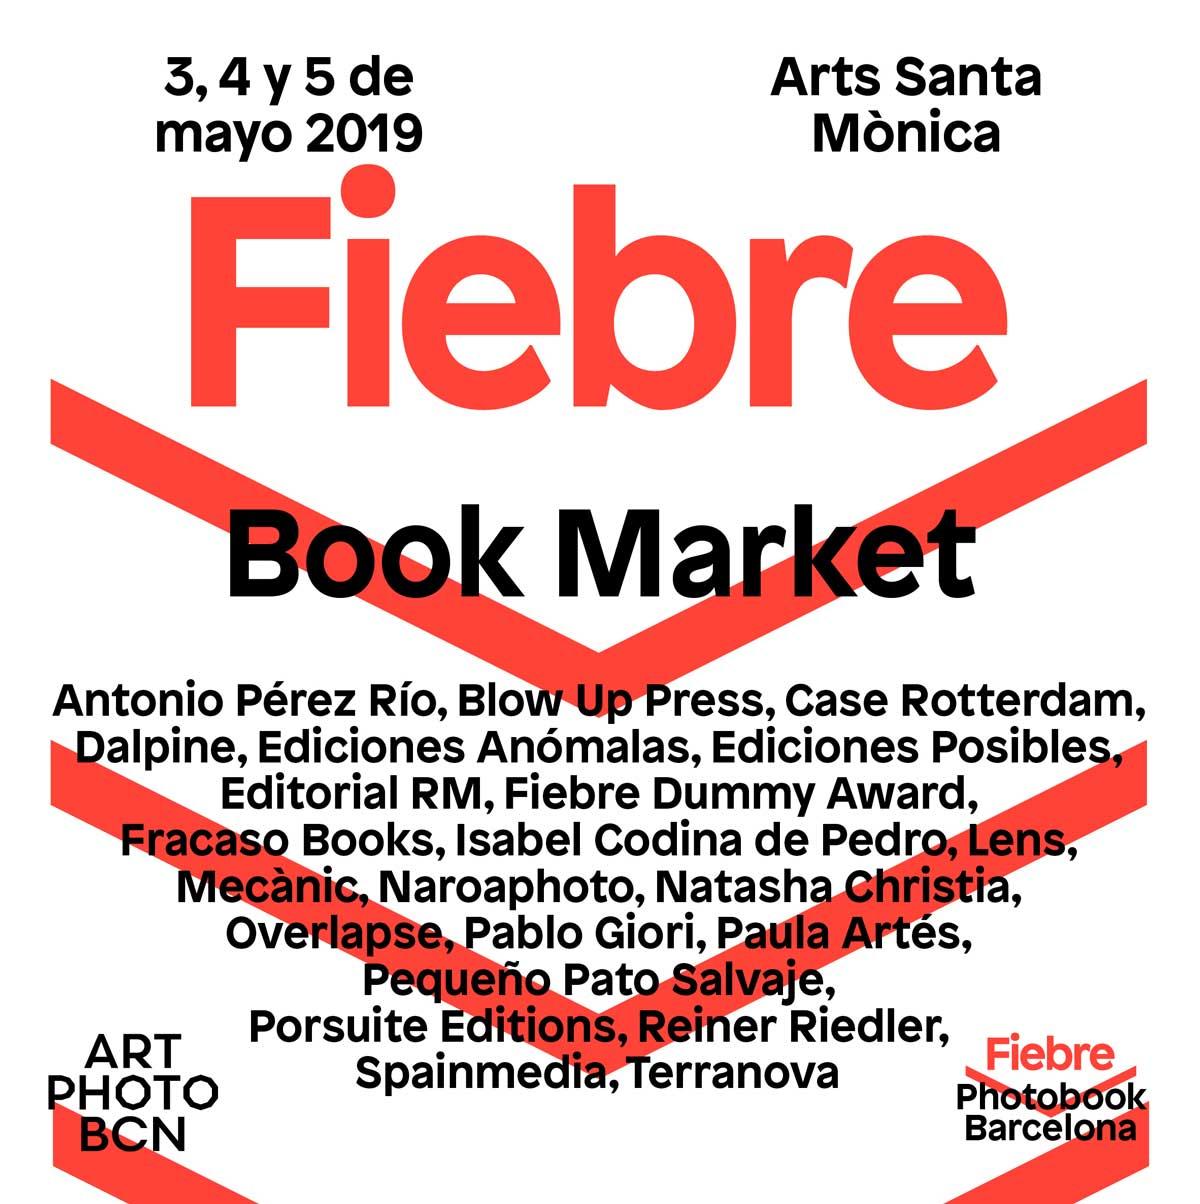 Fiebre Book Market 2019 BCN